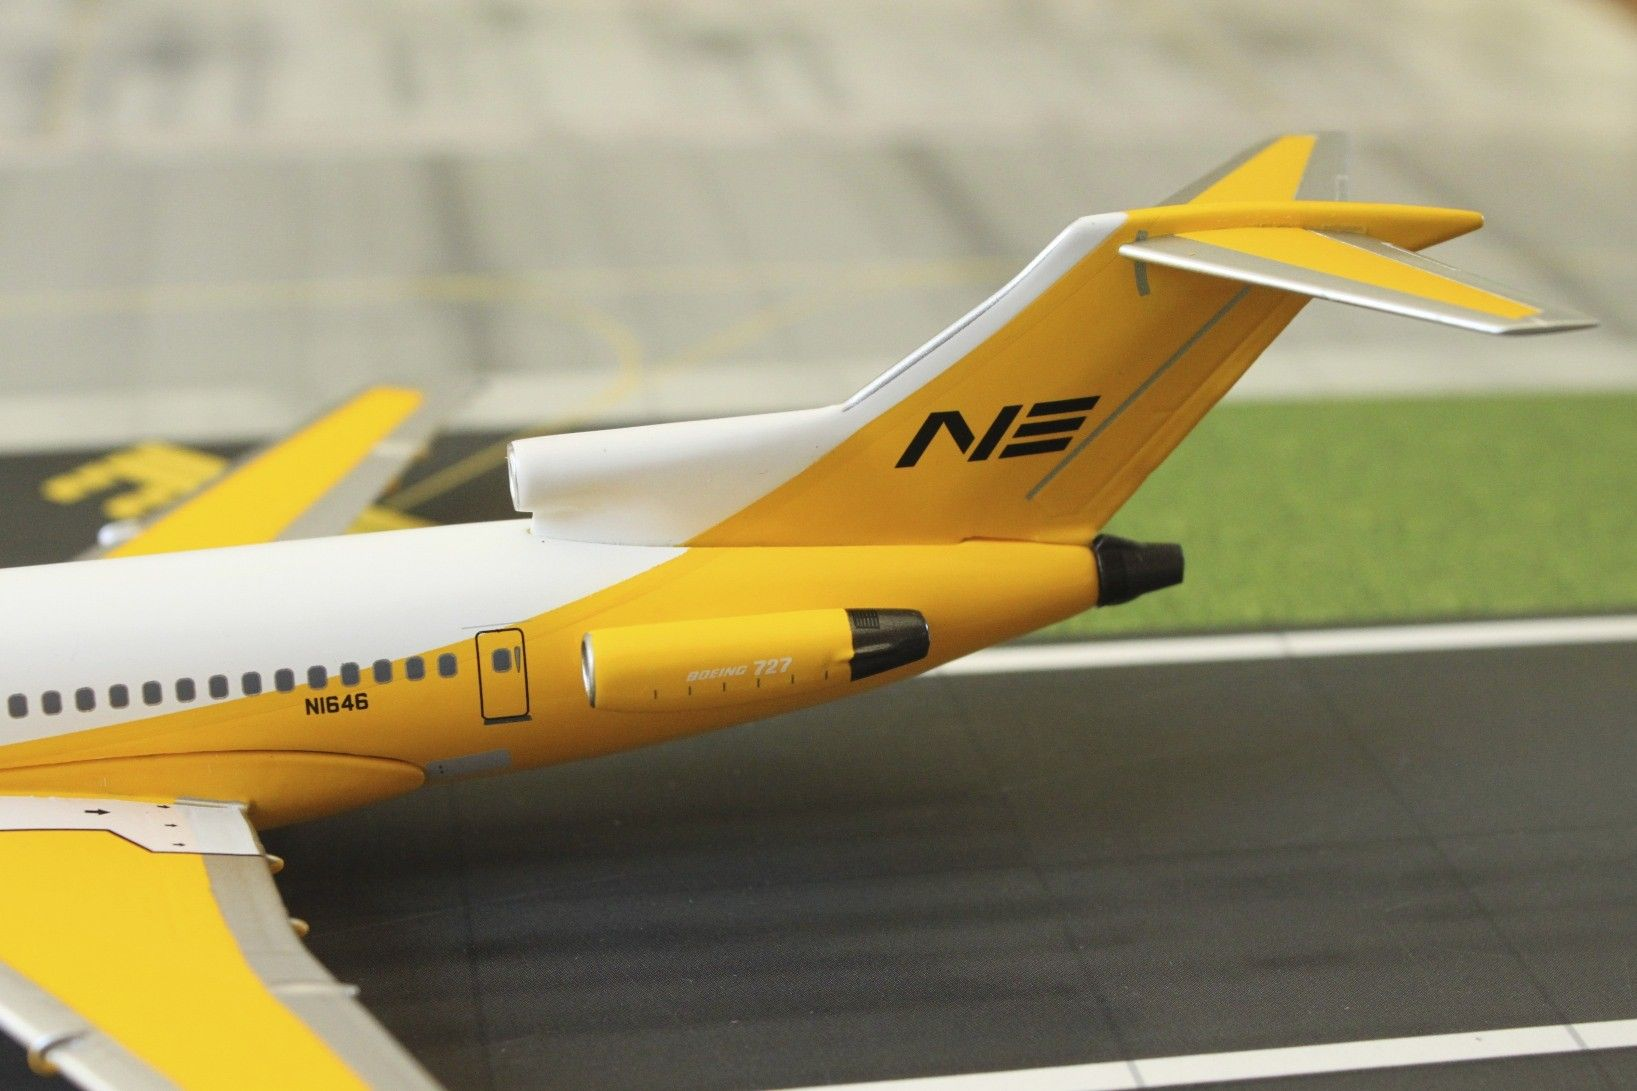 Northeast Yellow Bird Airline Logo - LogoDix